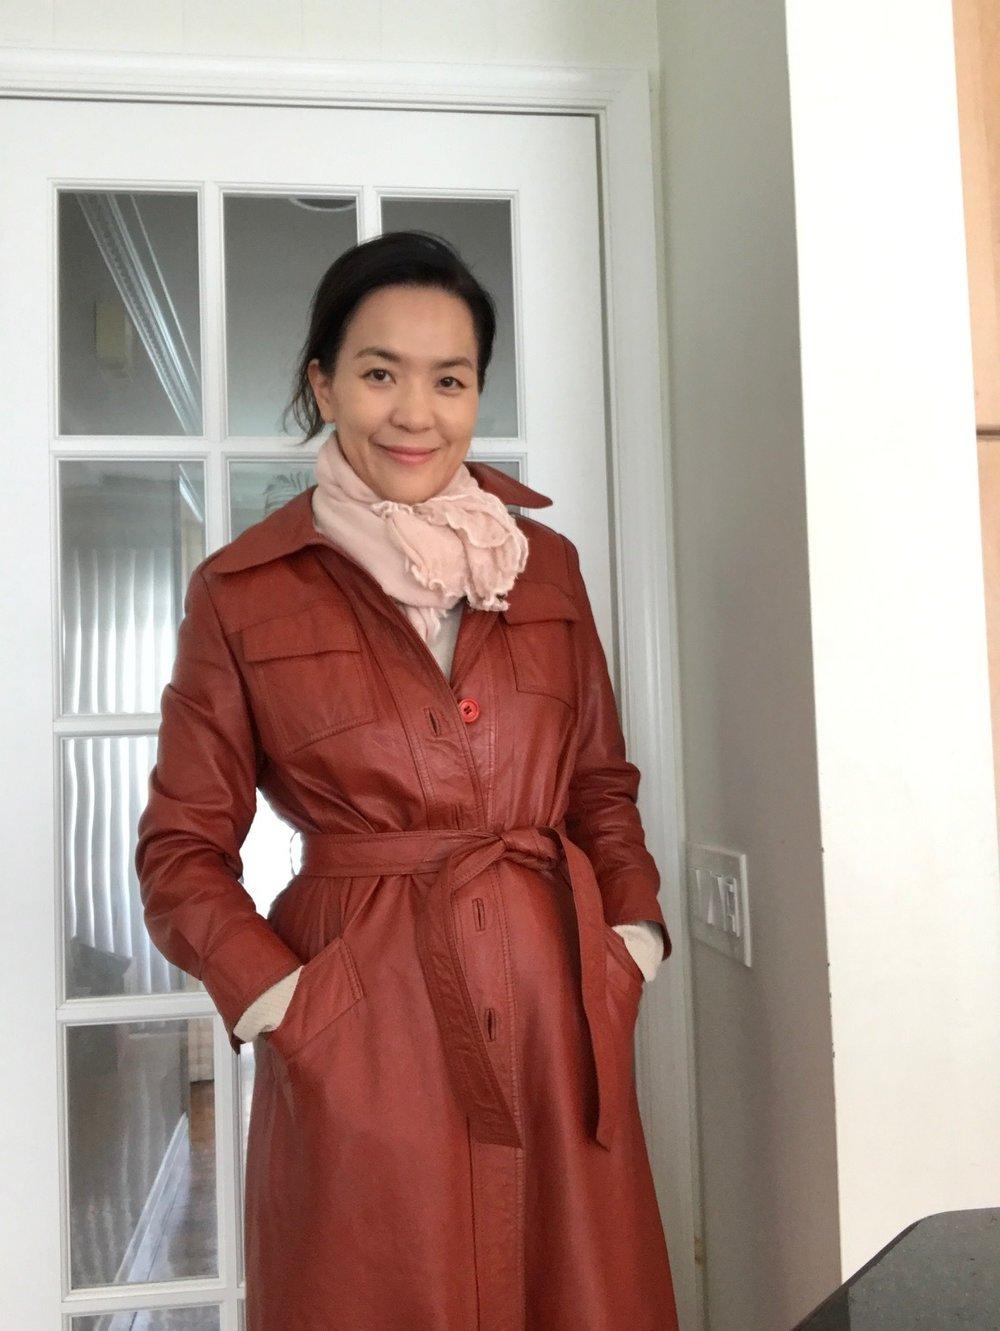 me wearing her jacket